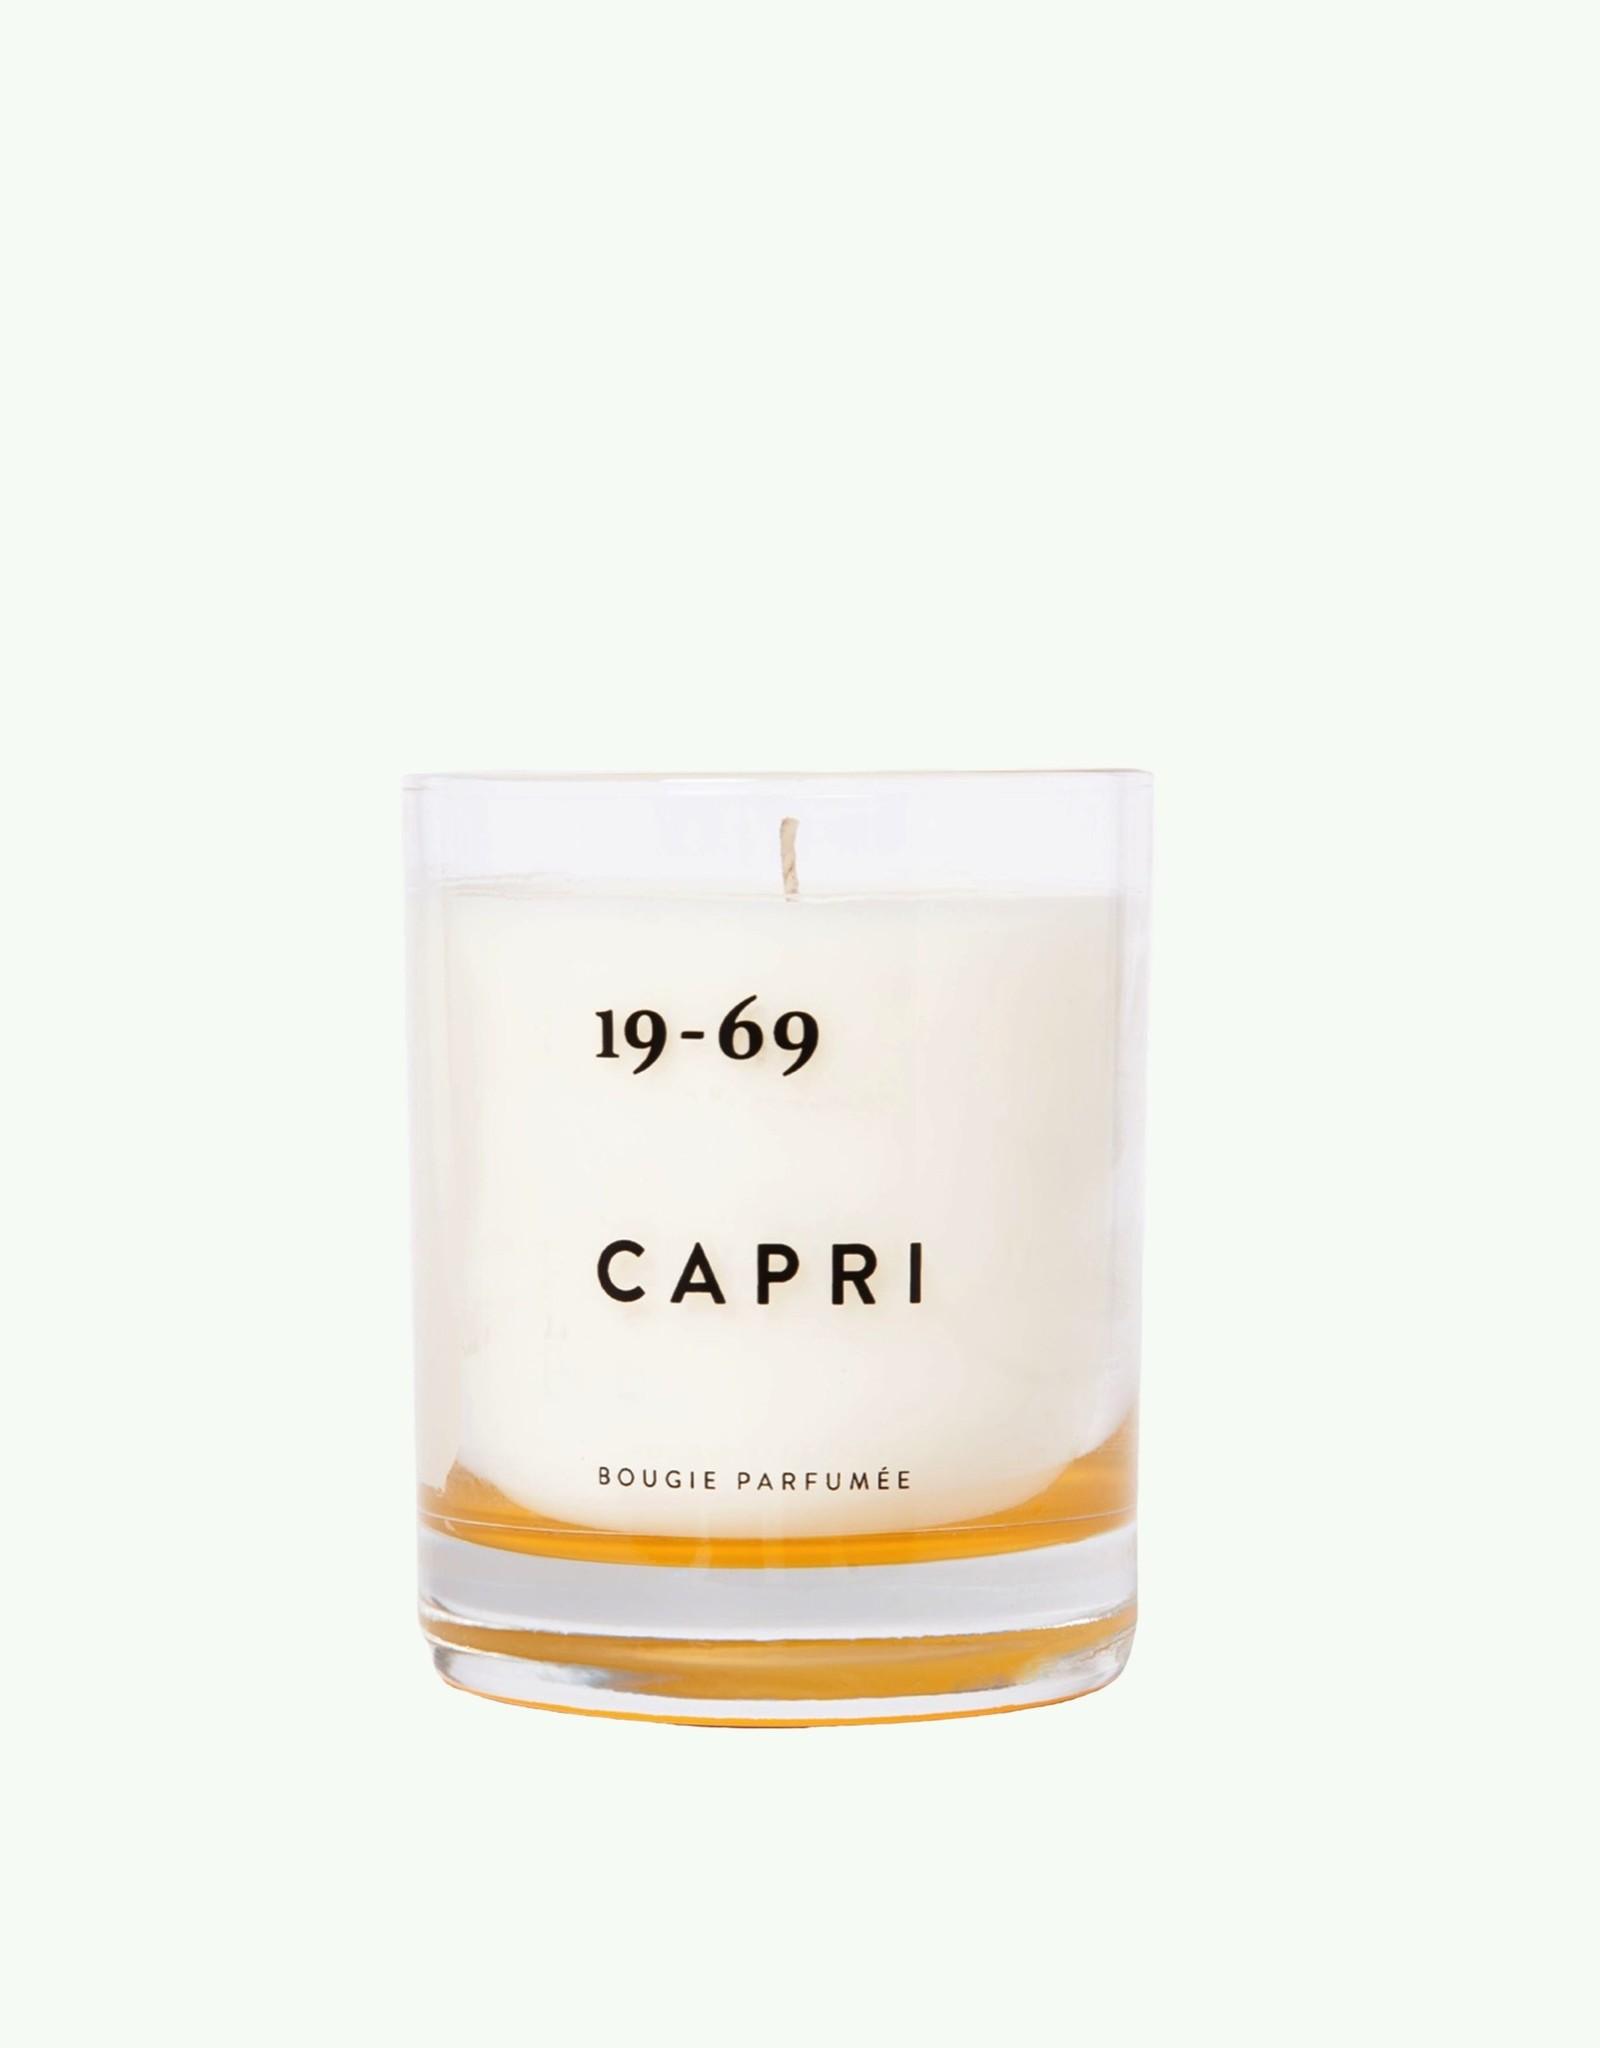 Nineteen Sixty Nine Nineteen sixty nine - Capri - Bougie parfumée 200 ml